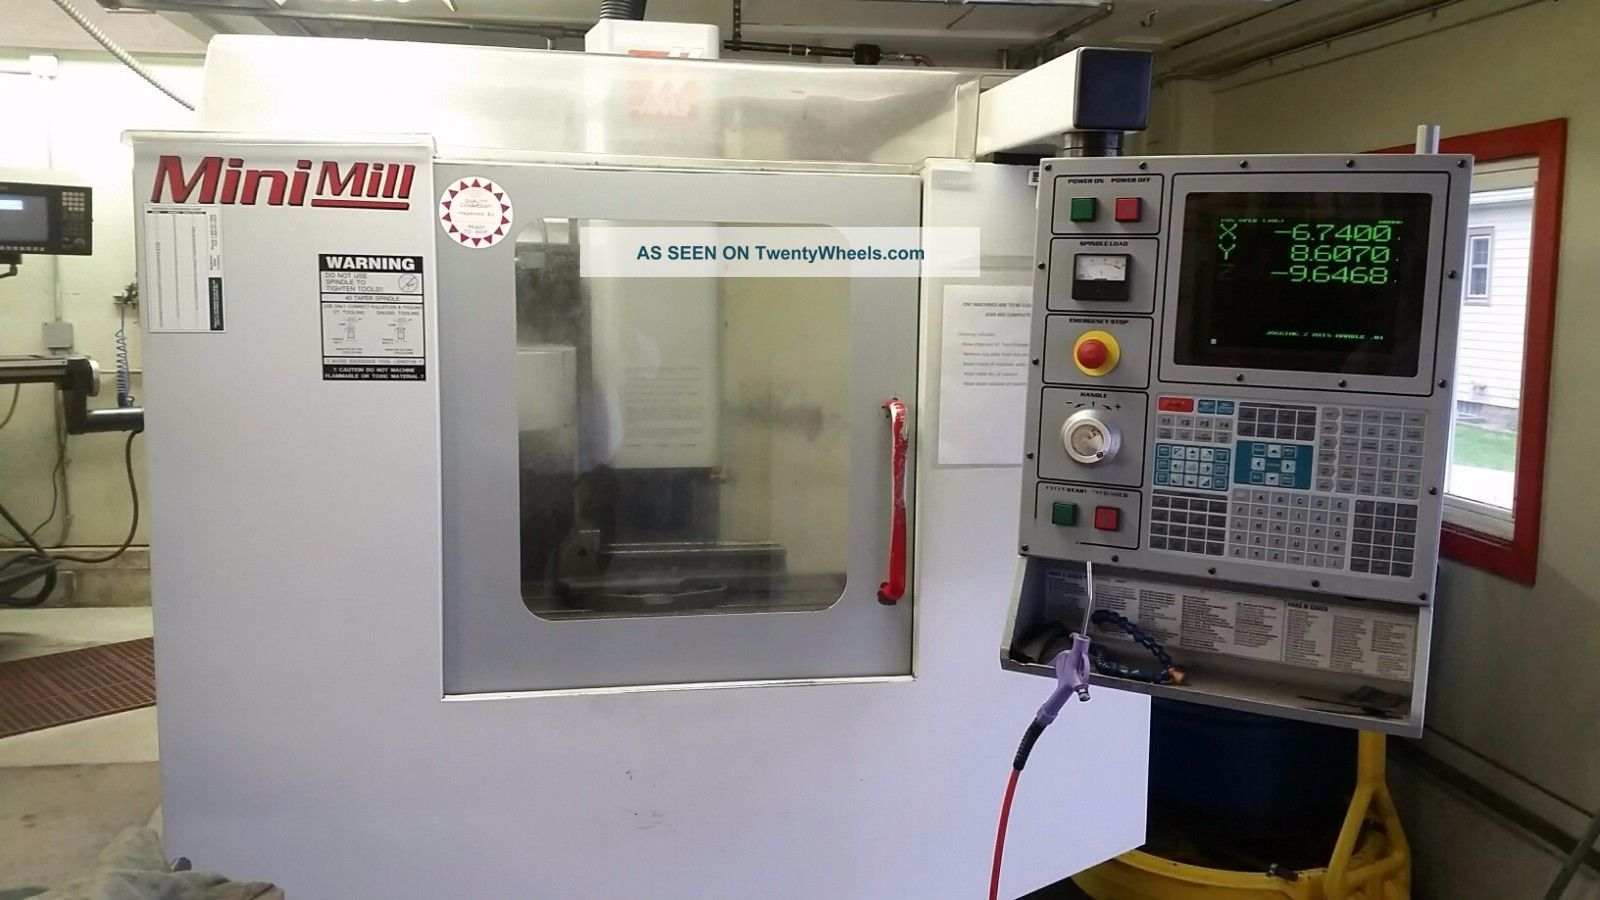 Haas Mini Mill Cnc Vertical Machining Center Ct40 Milling Rigid Tap 00 Milling Machines photo